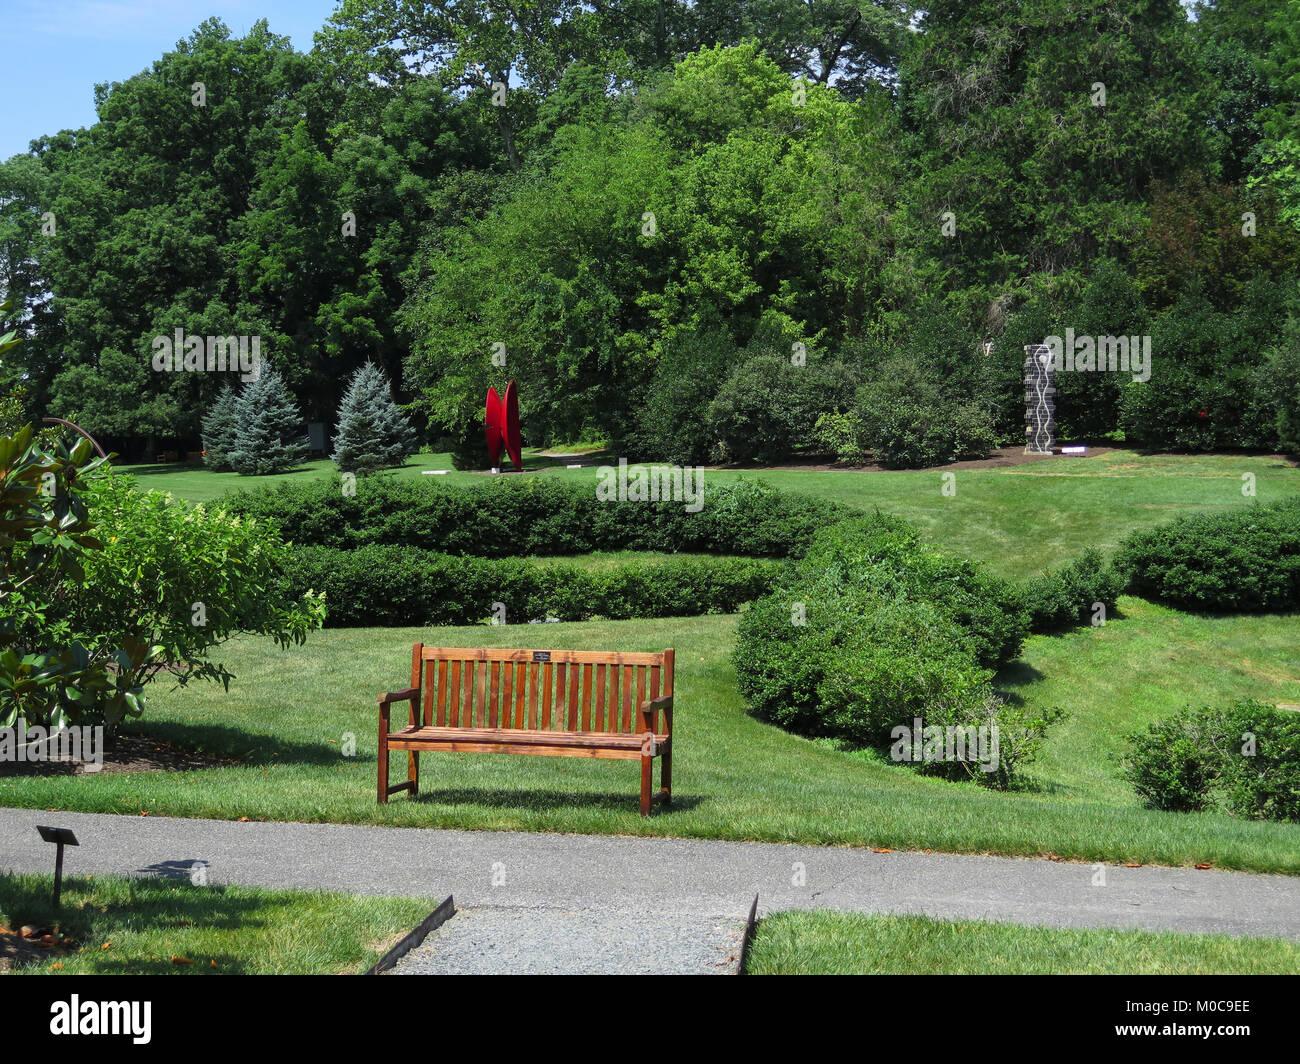 Delaware Art Museum, Wilmington, Delaware, art, sculpture, Parc. Jardin de sculptures, l'art, d'illustration Photo Stock